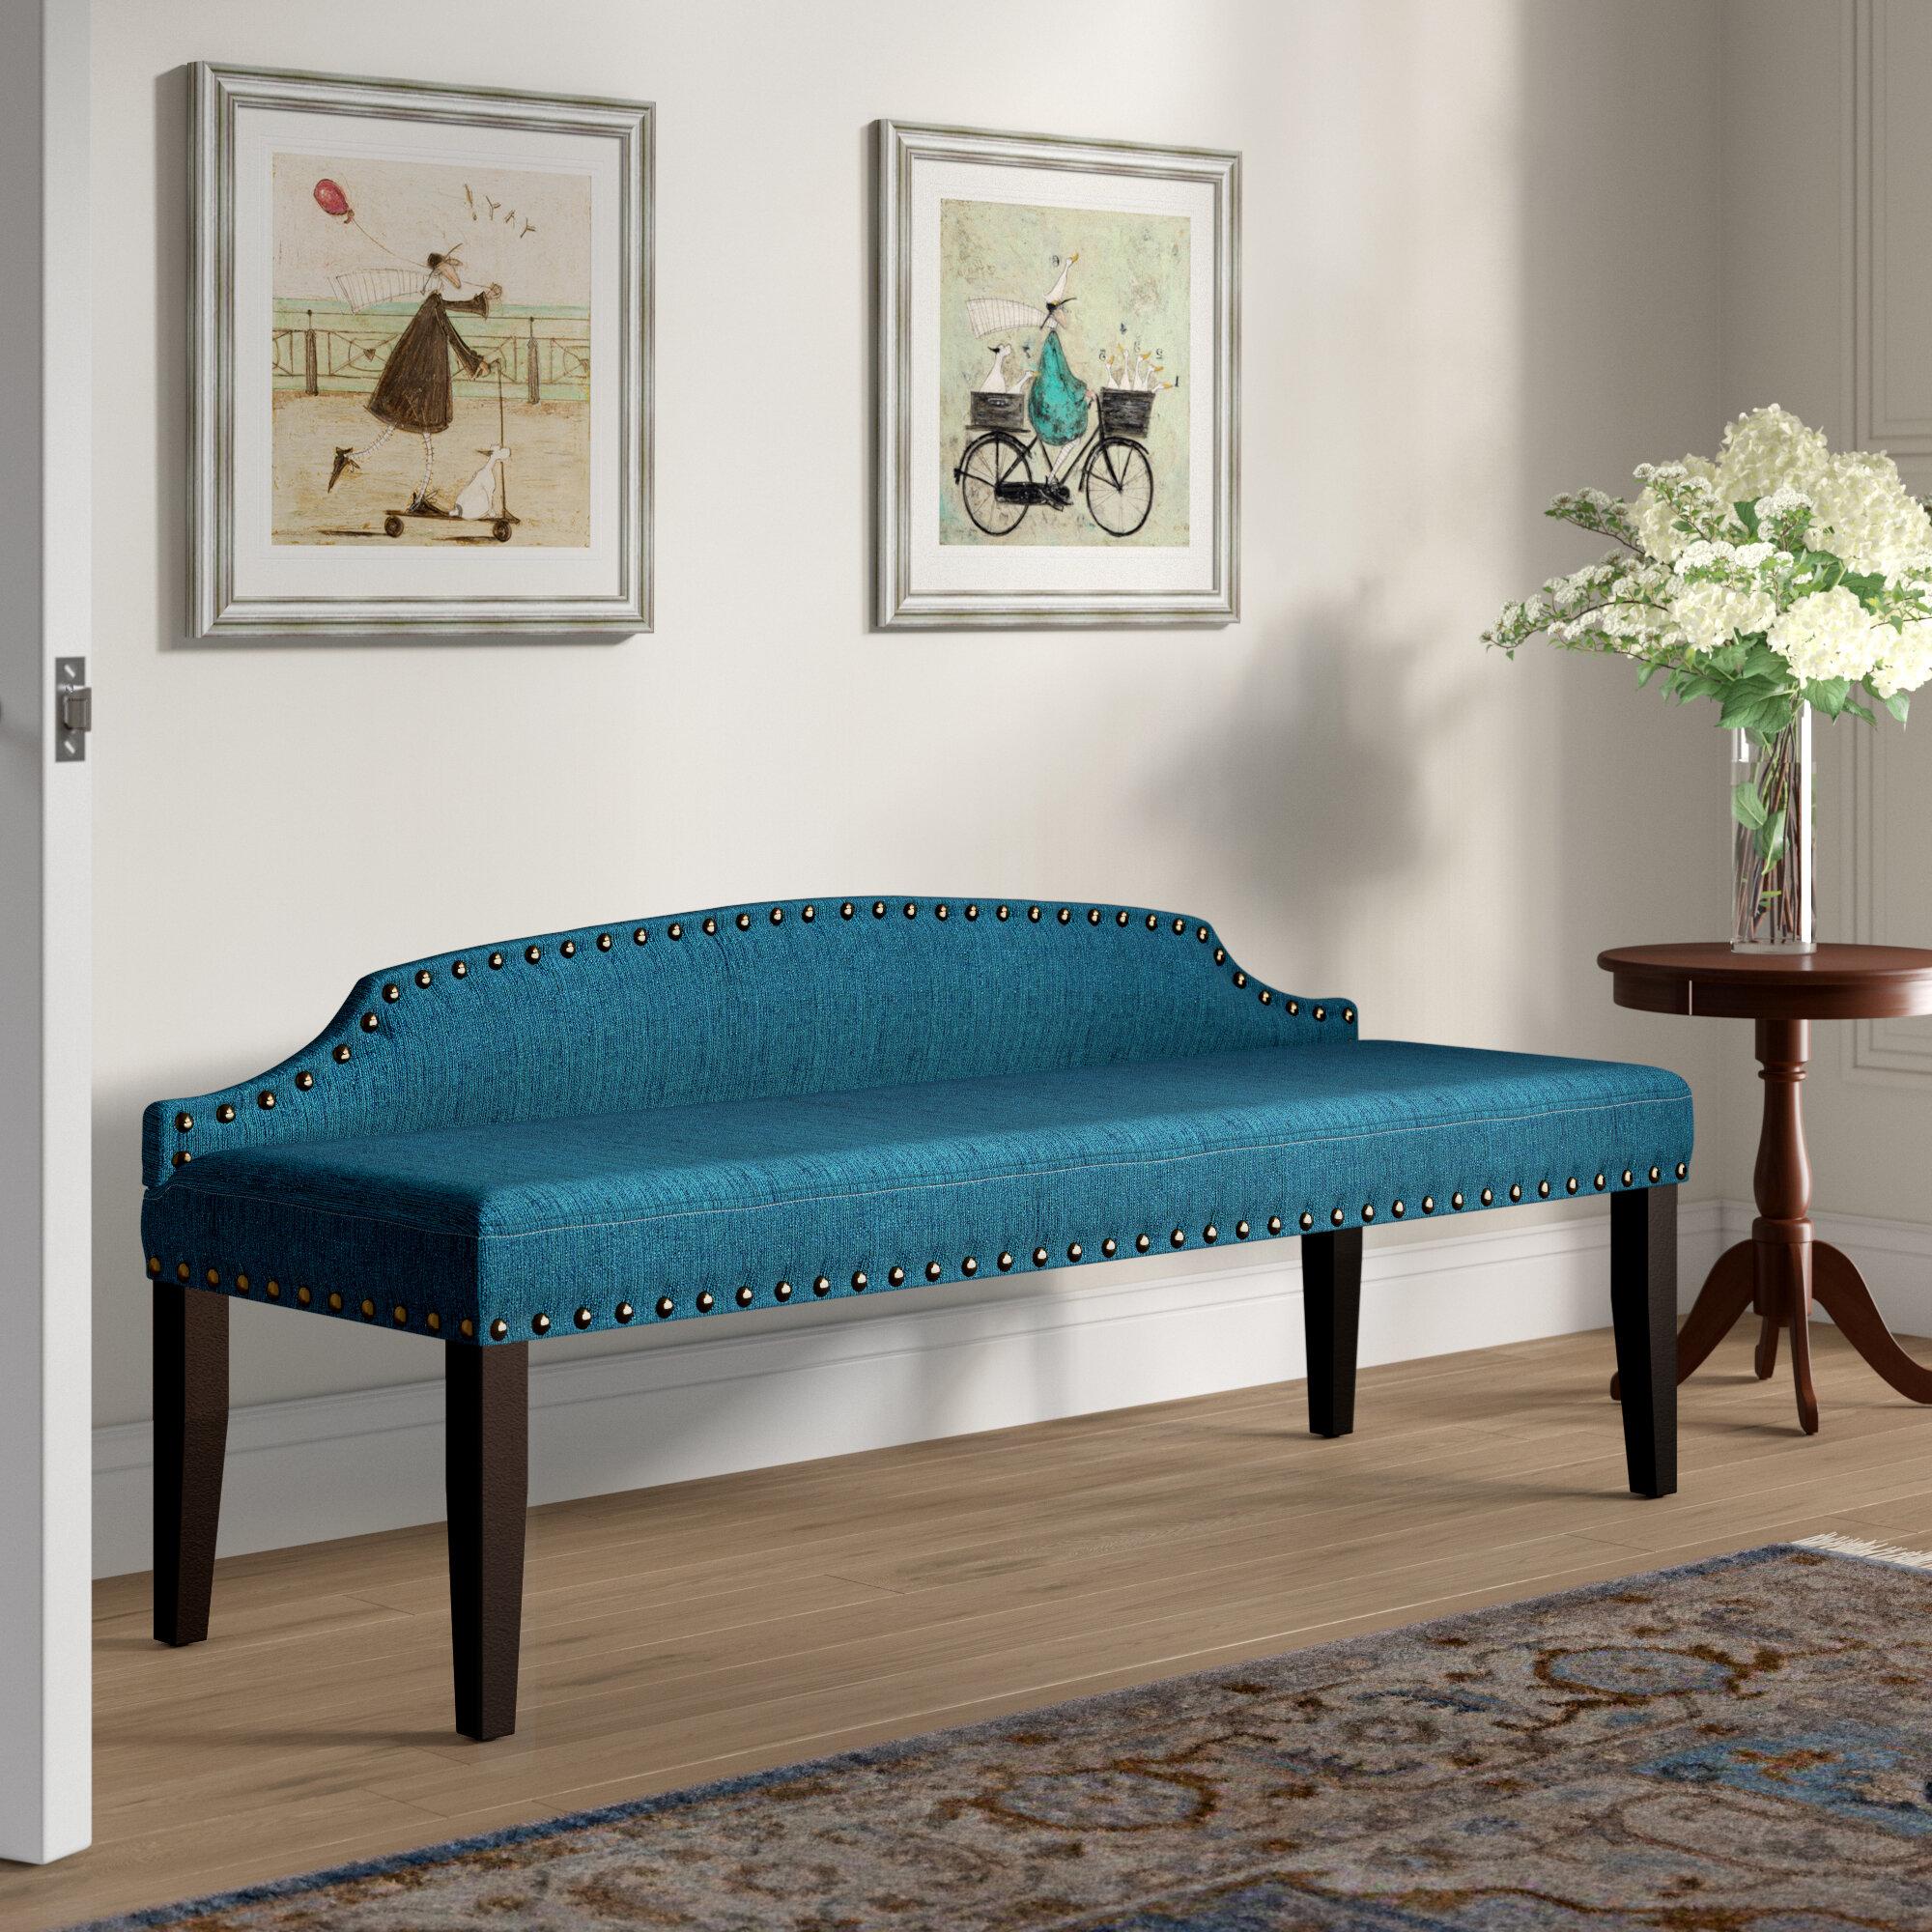 Three Posts Millersburg Upholstered Bench & Reviews | Wayfair